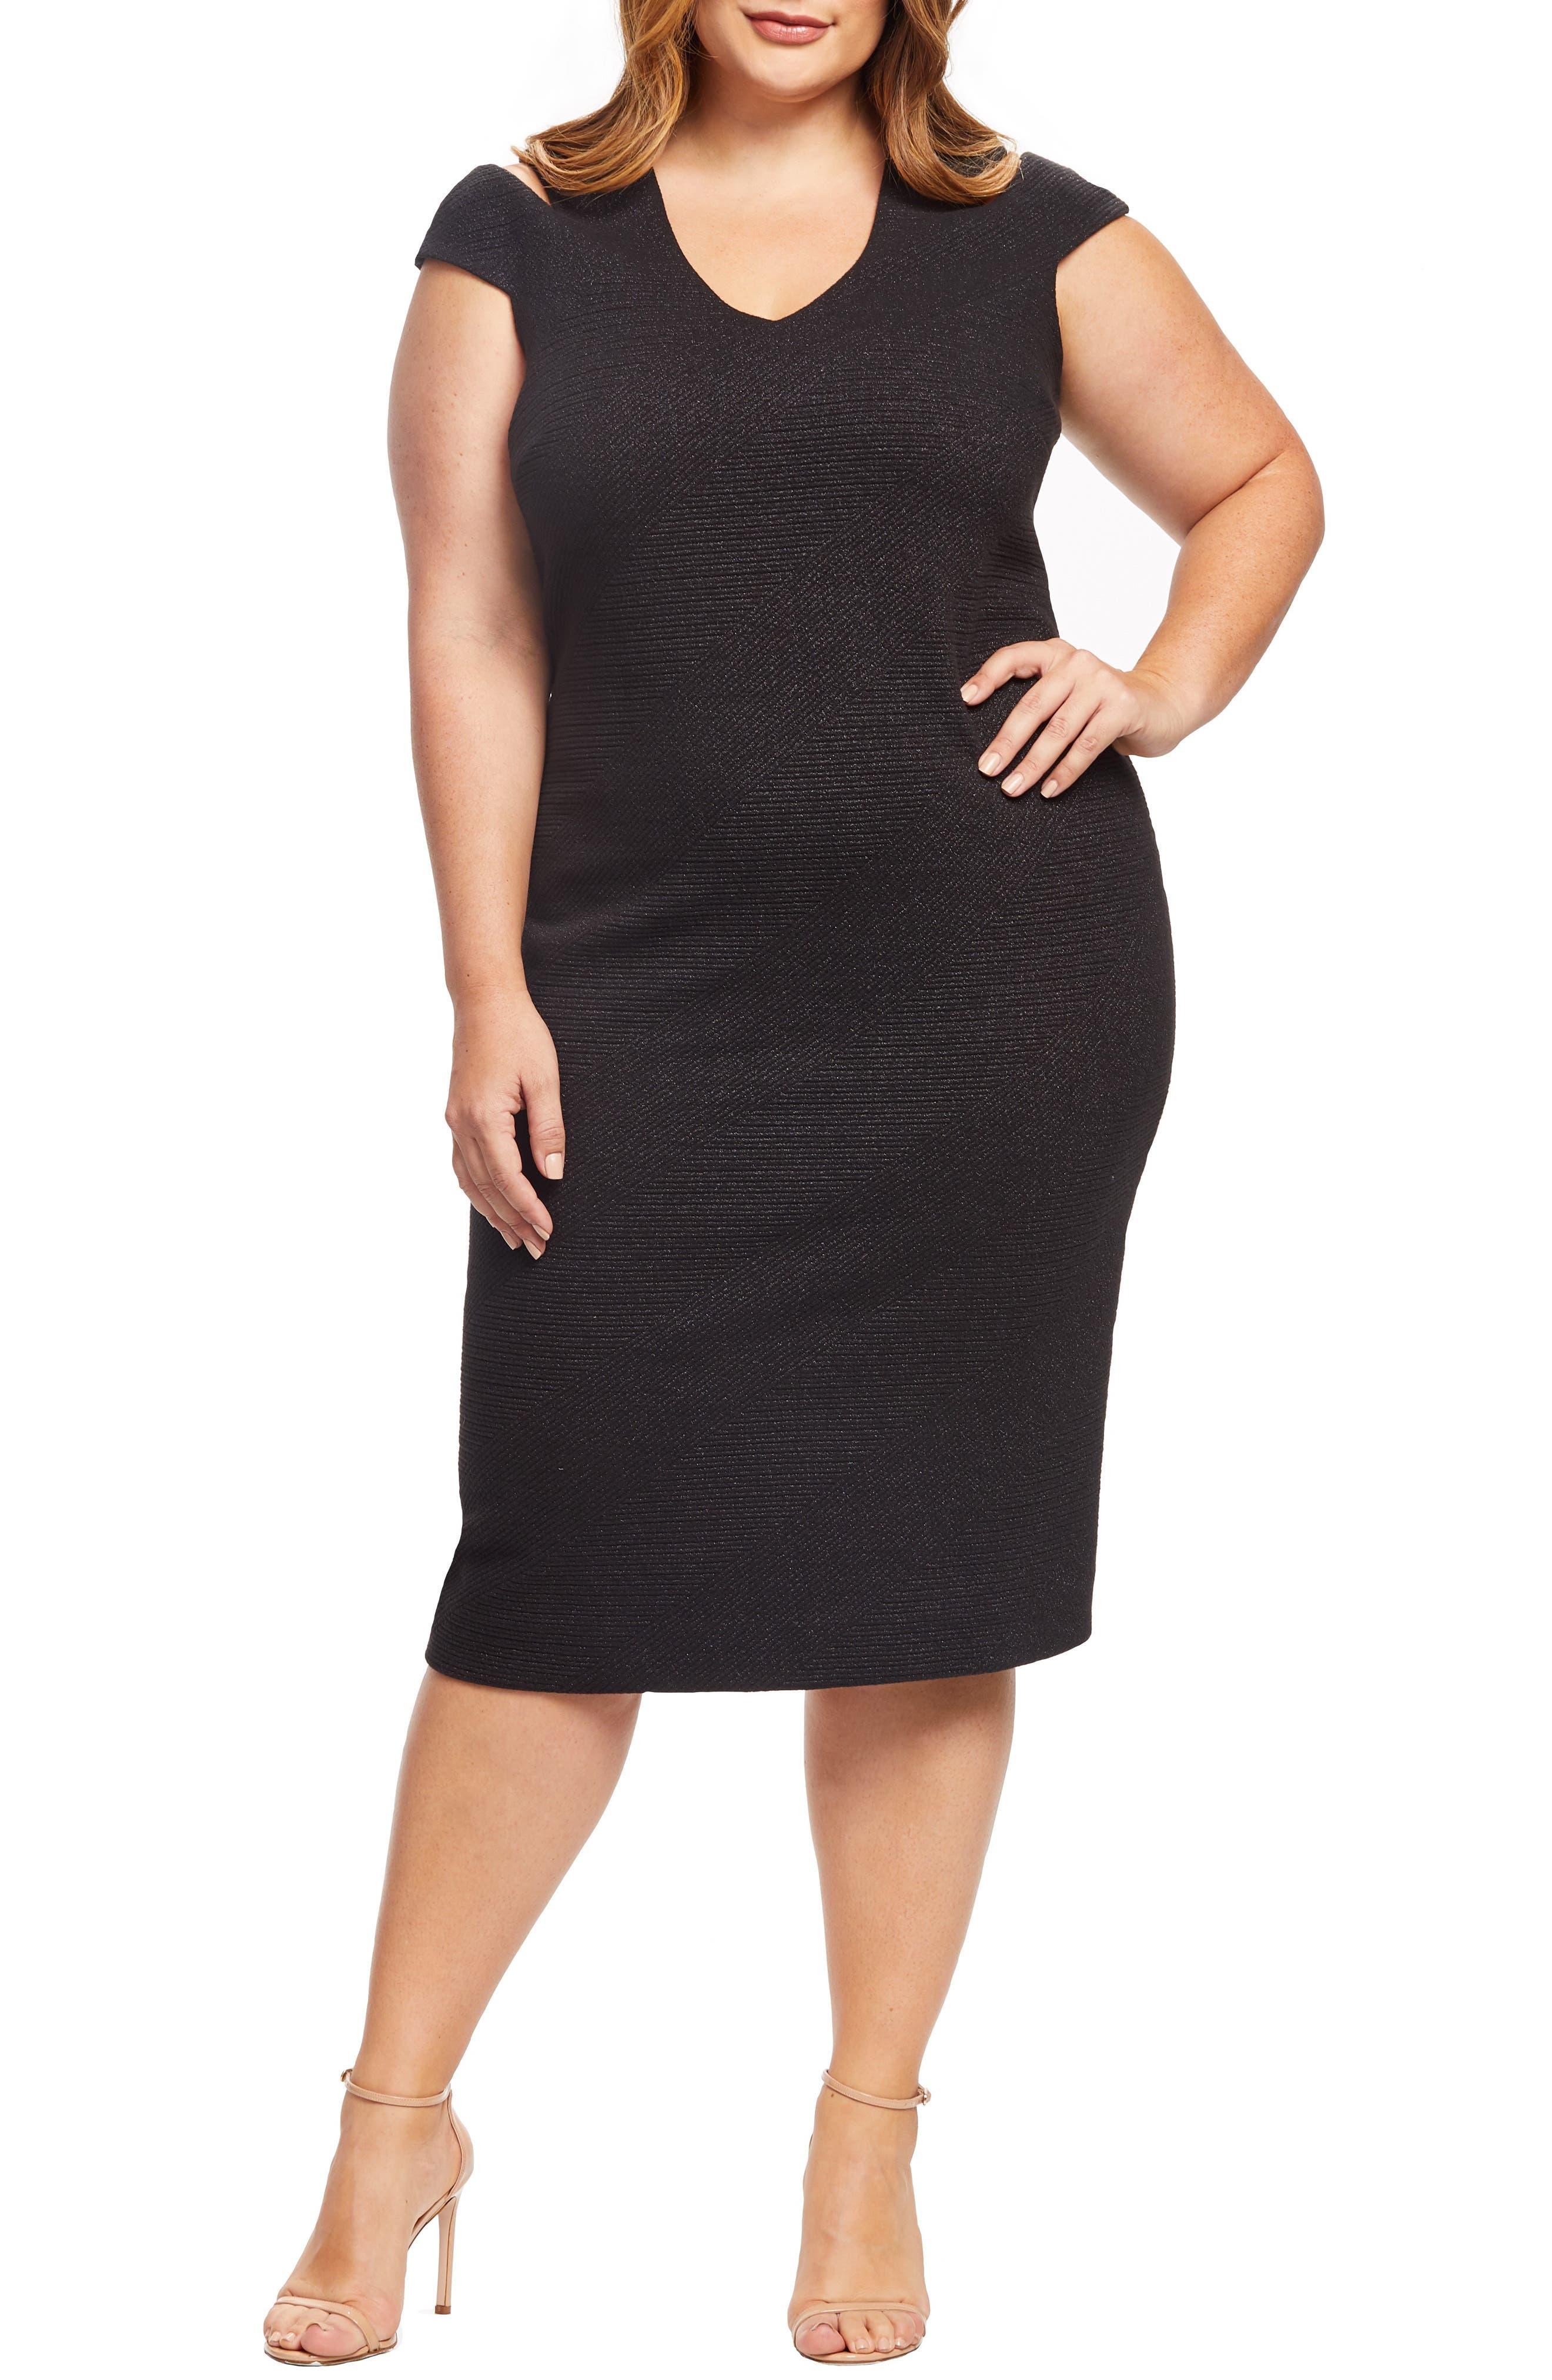 DRESS THE POPULATION Bryce Slit Sleeve Knit Midi Dress in Black